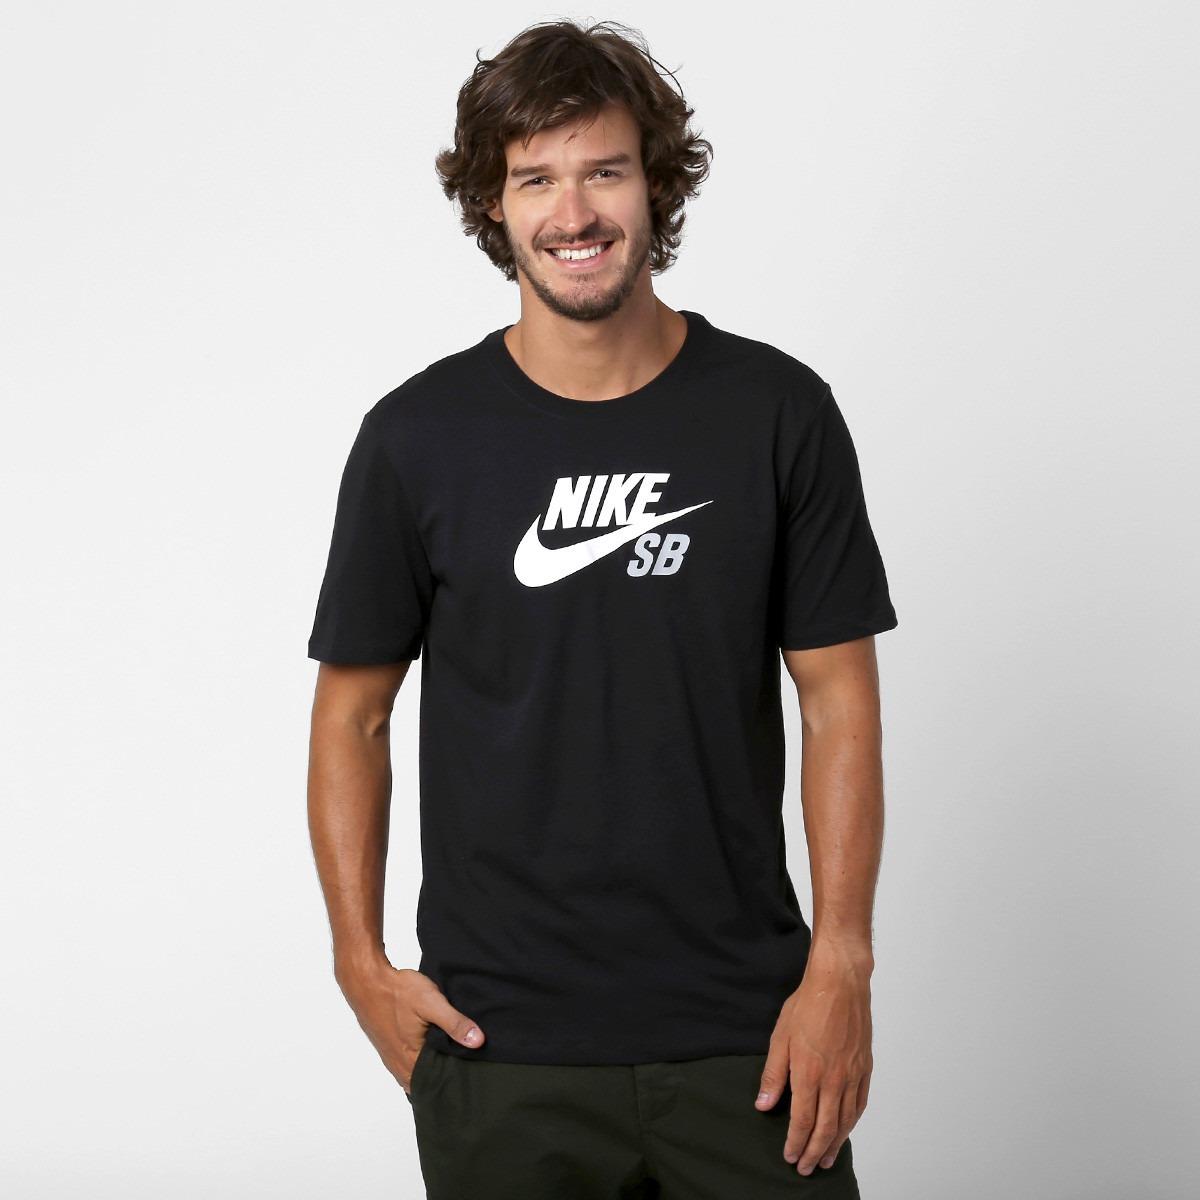 camiseta nike sb icon logo original. Carregando zoom. 3159dd0f21360